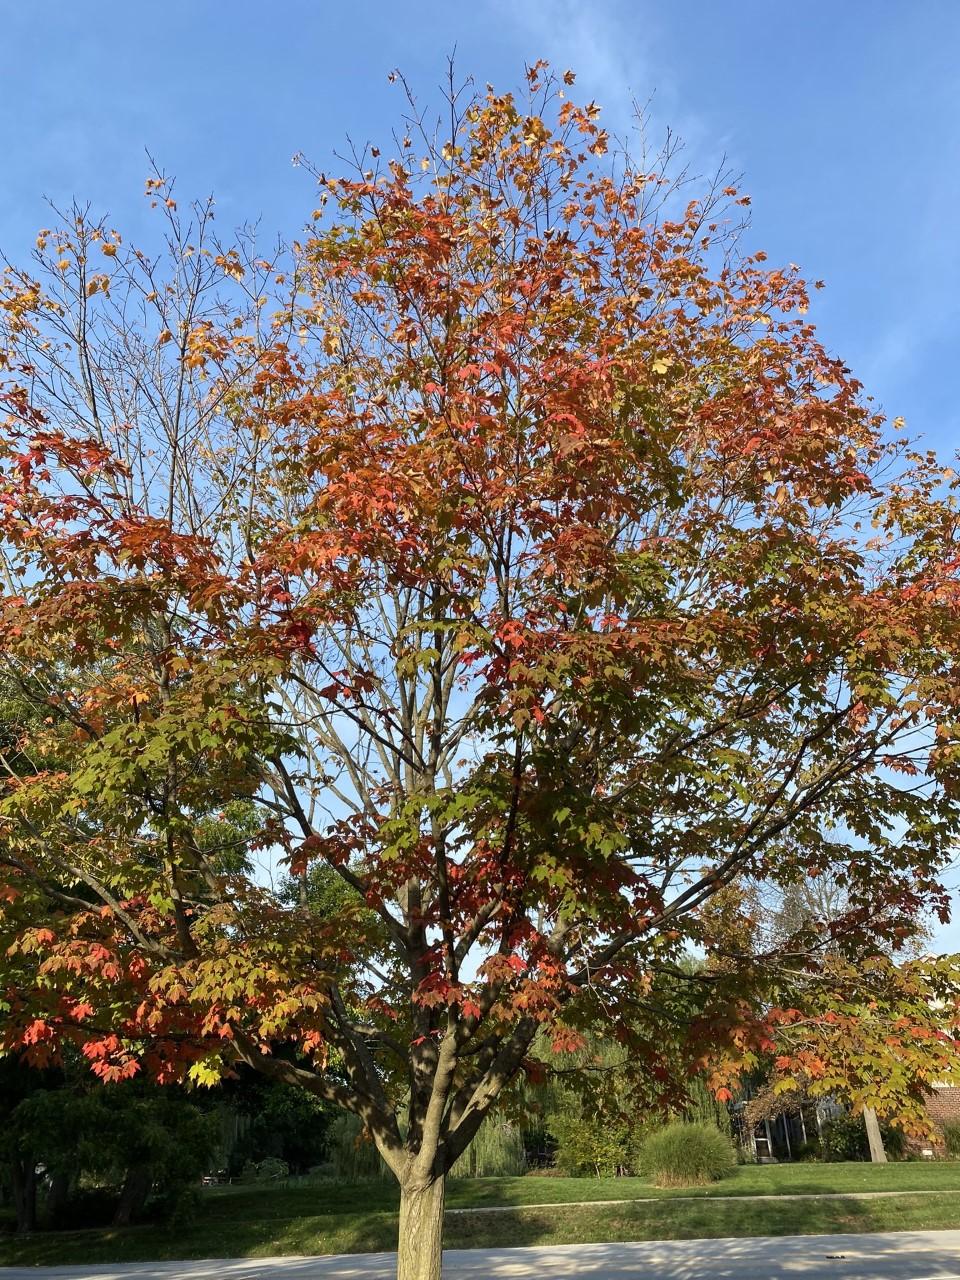 Fall foliage in Indiana